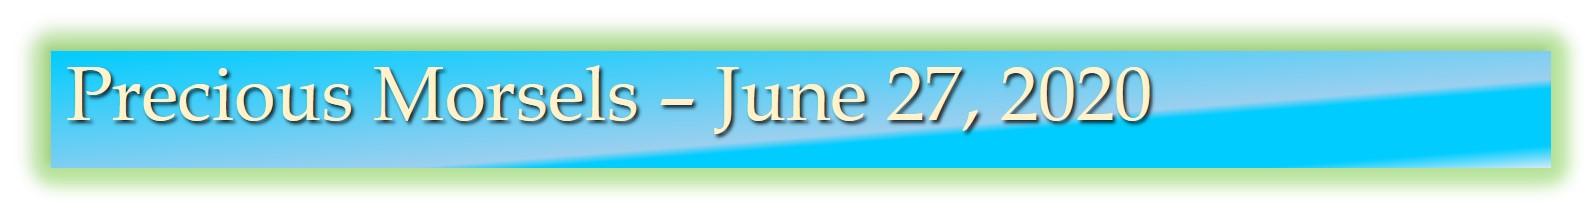 Precious Morsels 2 June 27, 2020